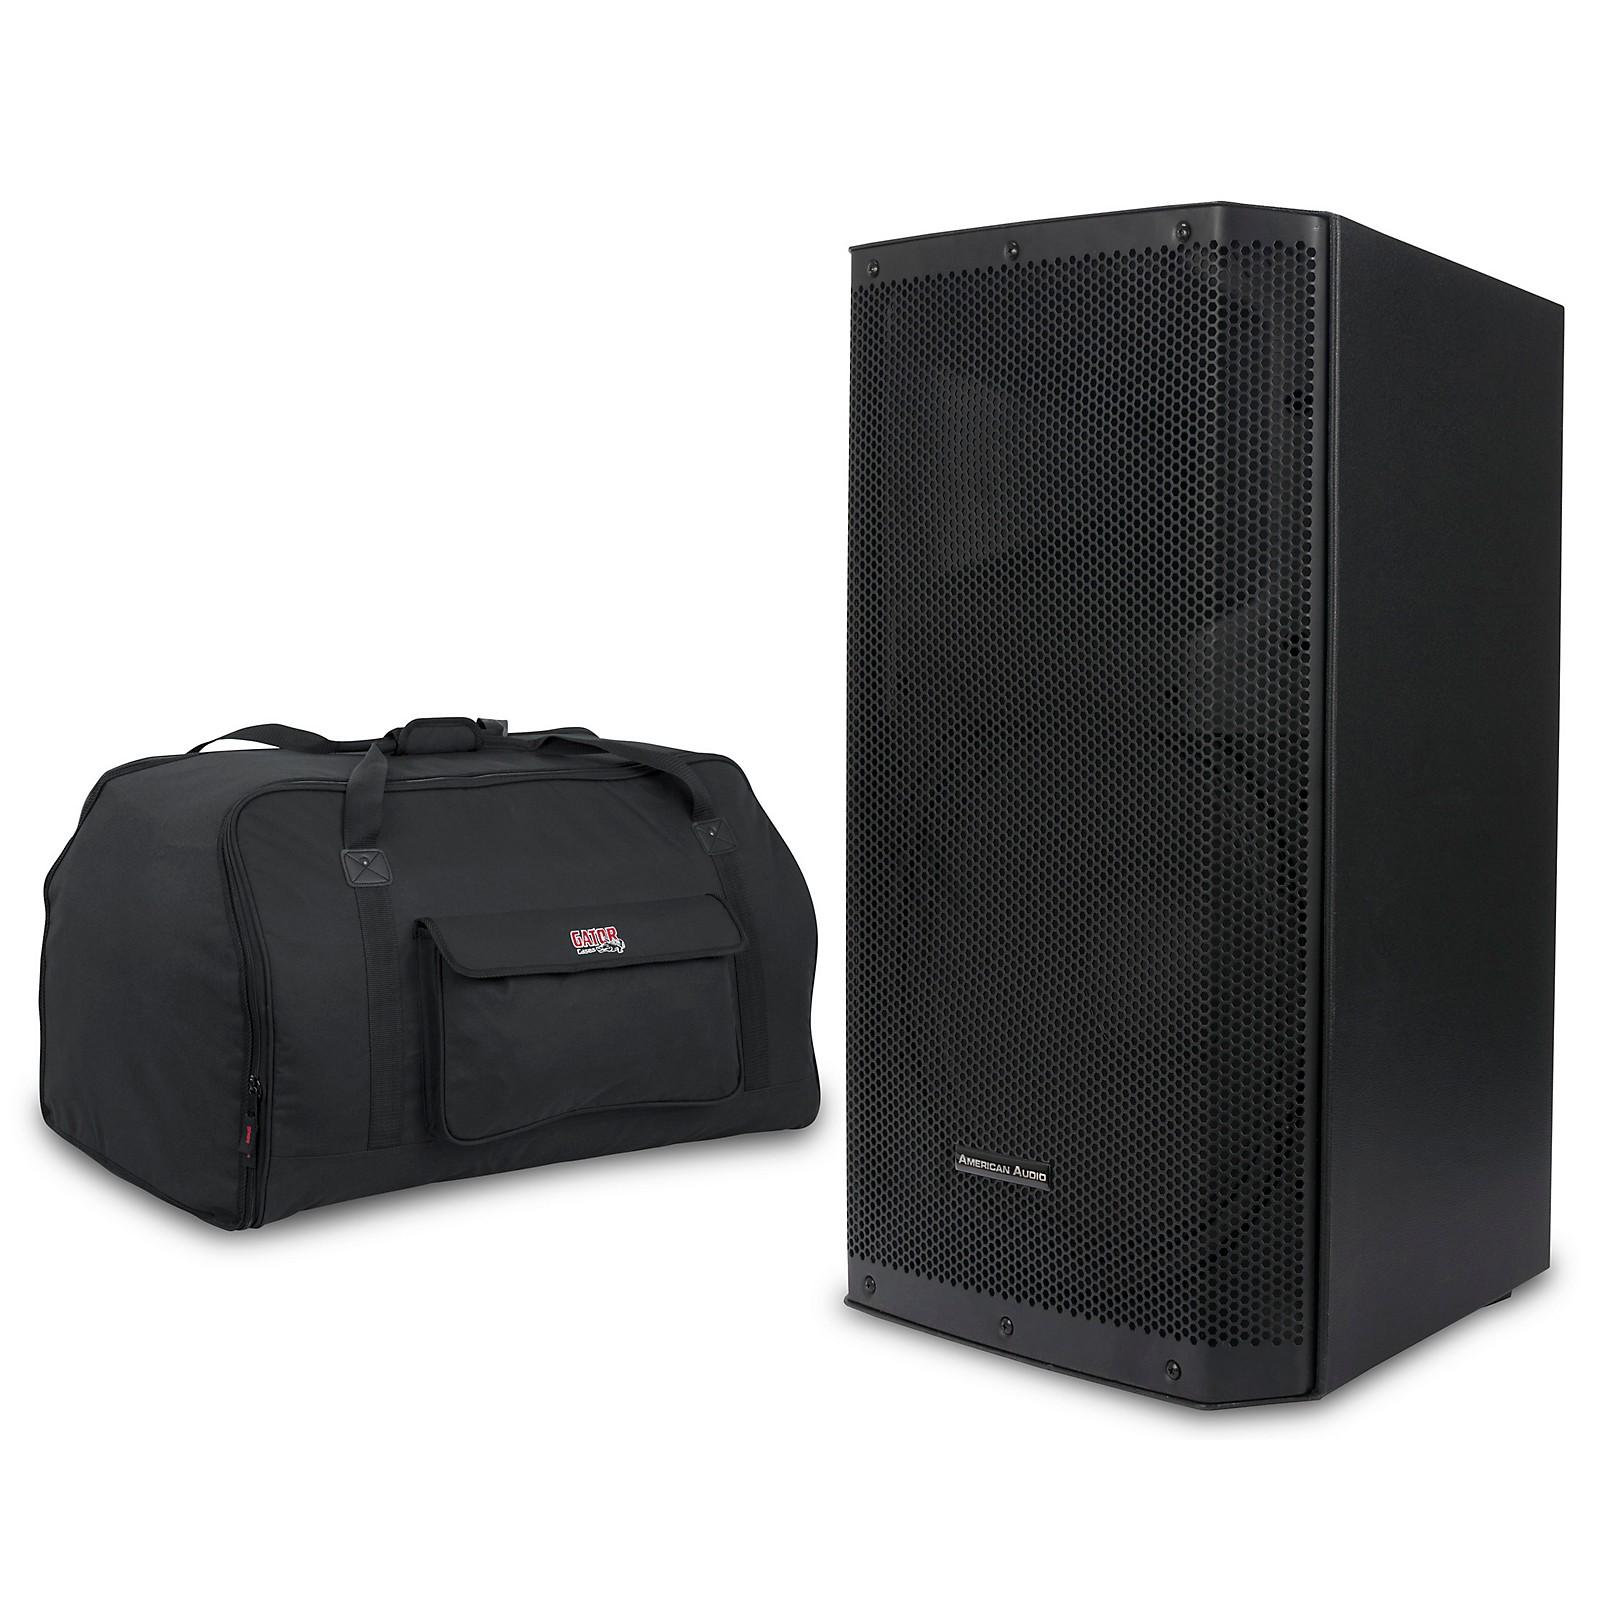 American Audio Kpow 15BT MK II 1,000W Powered Speaker with Tote